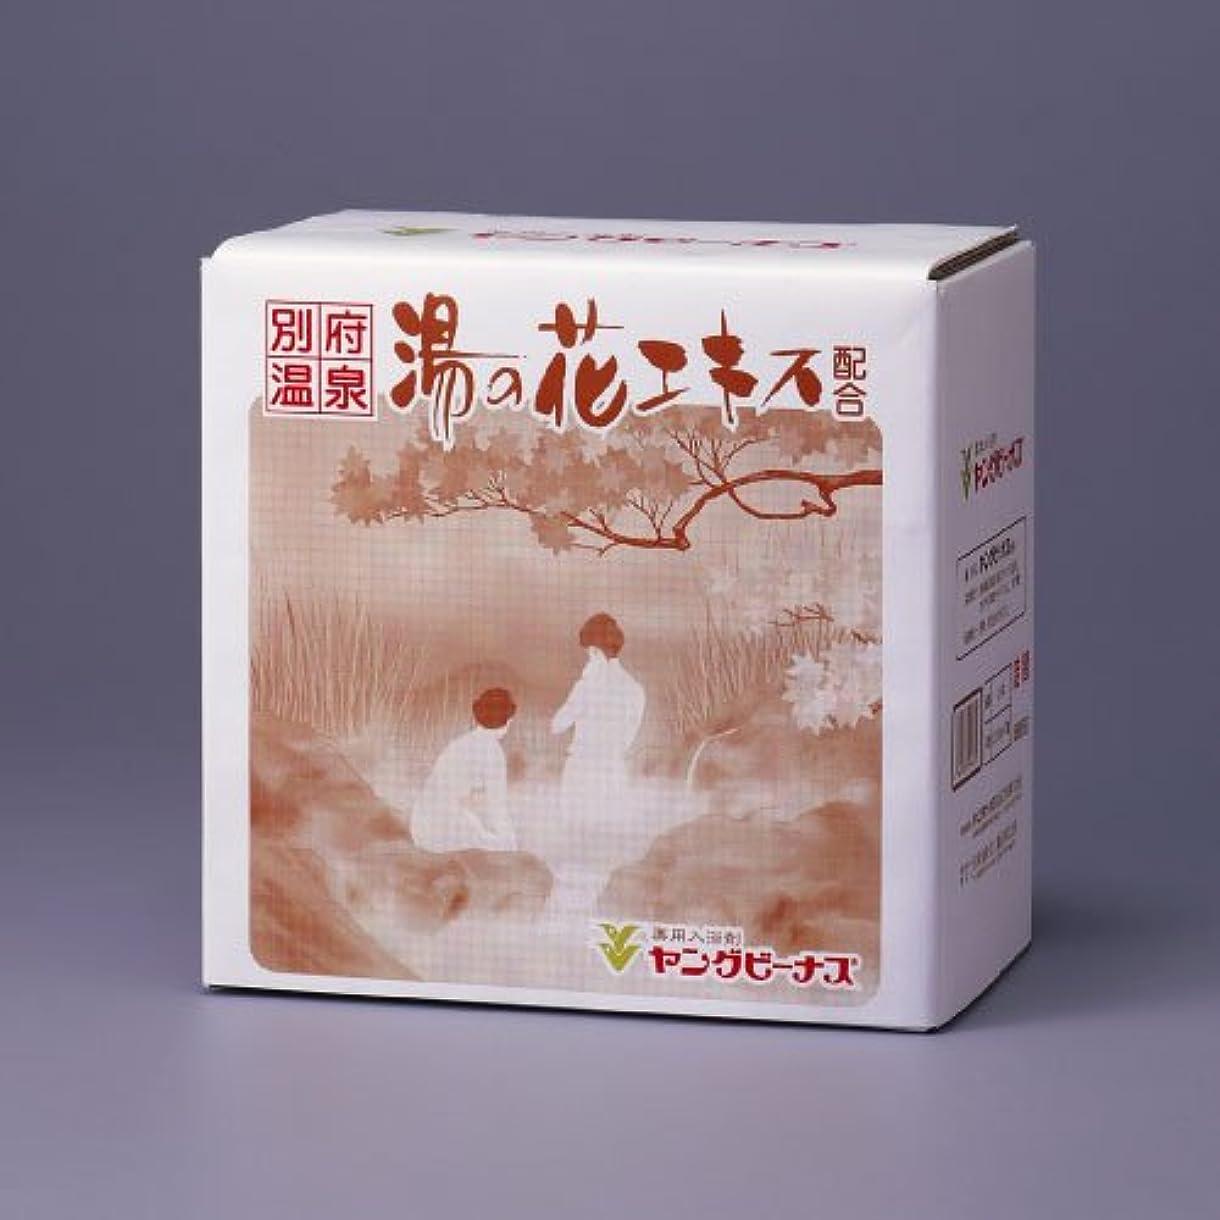 甥連帯理解薬用入浴剤ヤングビーナスSv C-60【5.6kg】(詰替2.8kg2袋) [医薬部外品]